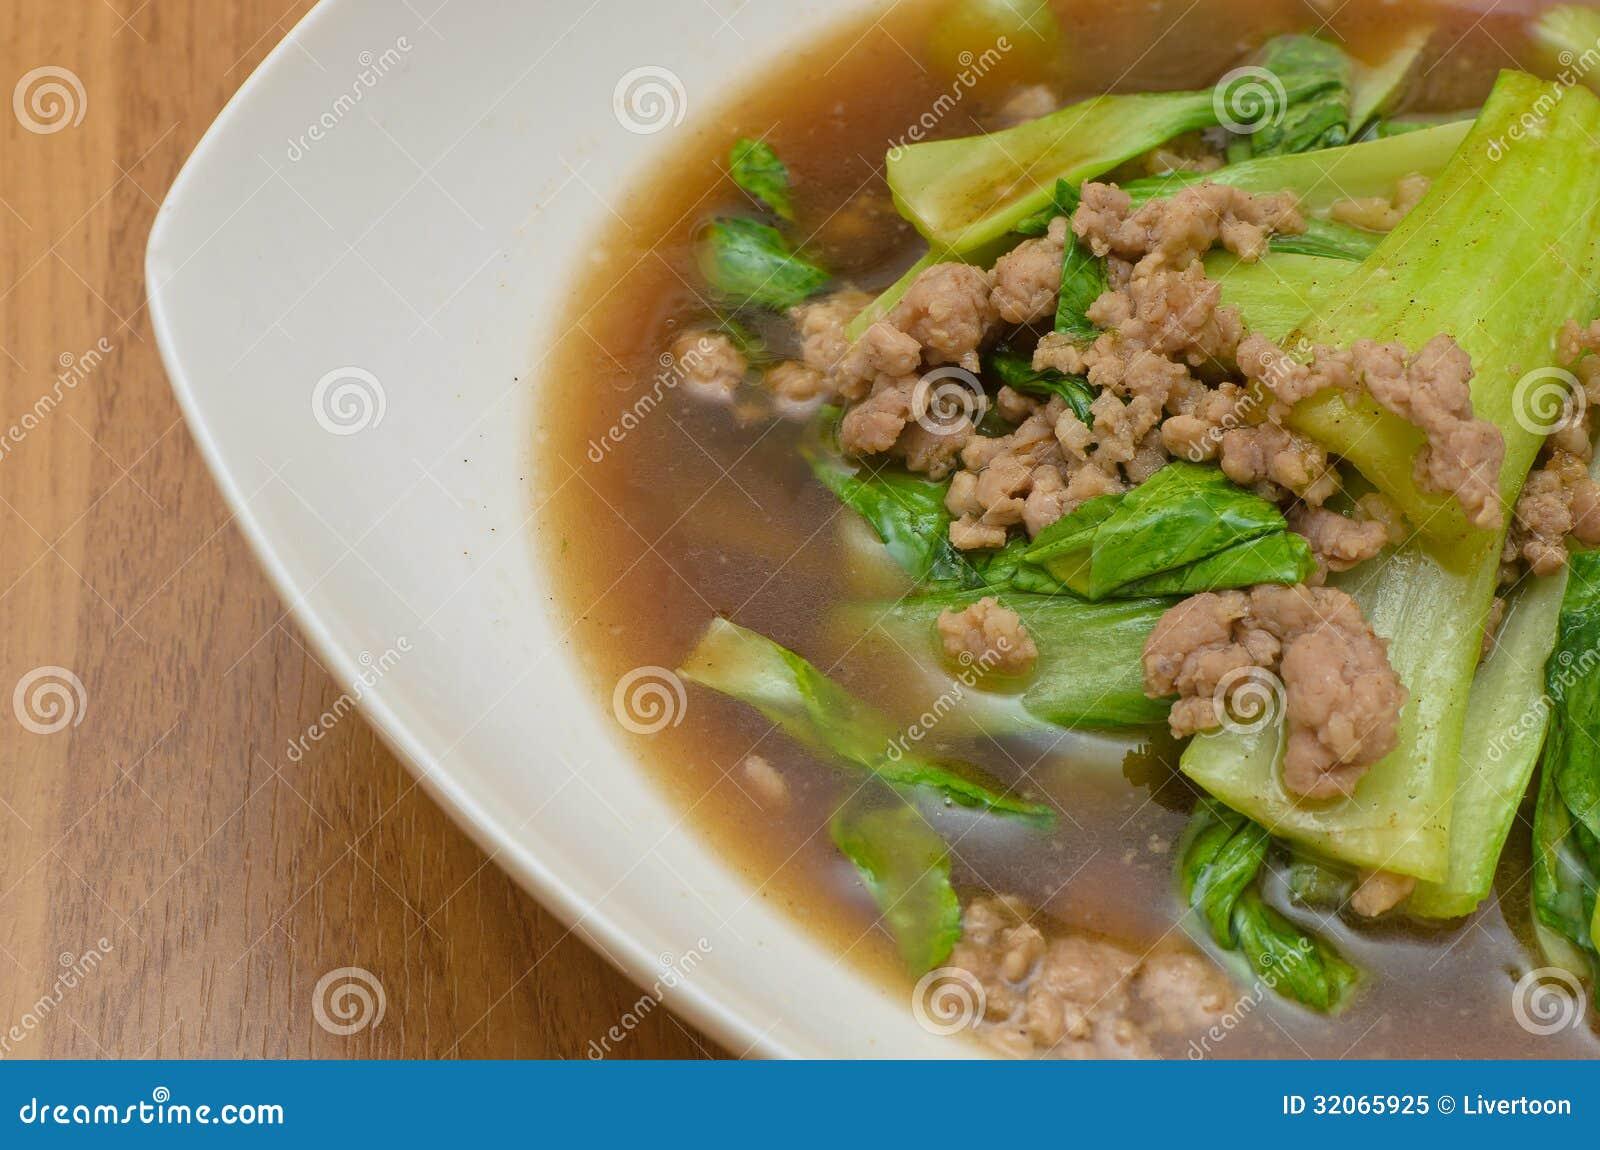 Healthful Chinese Food